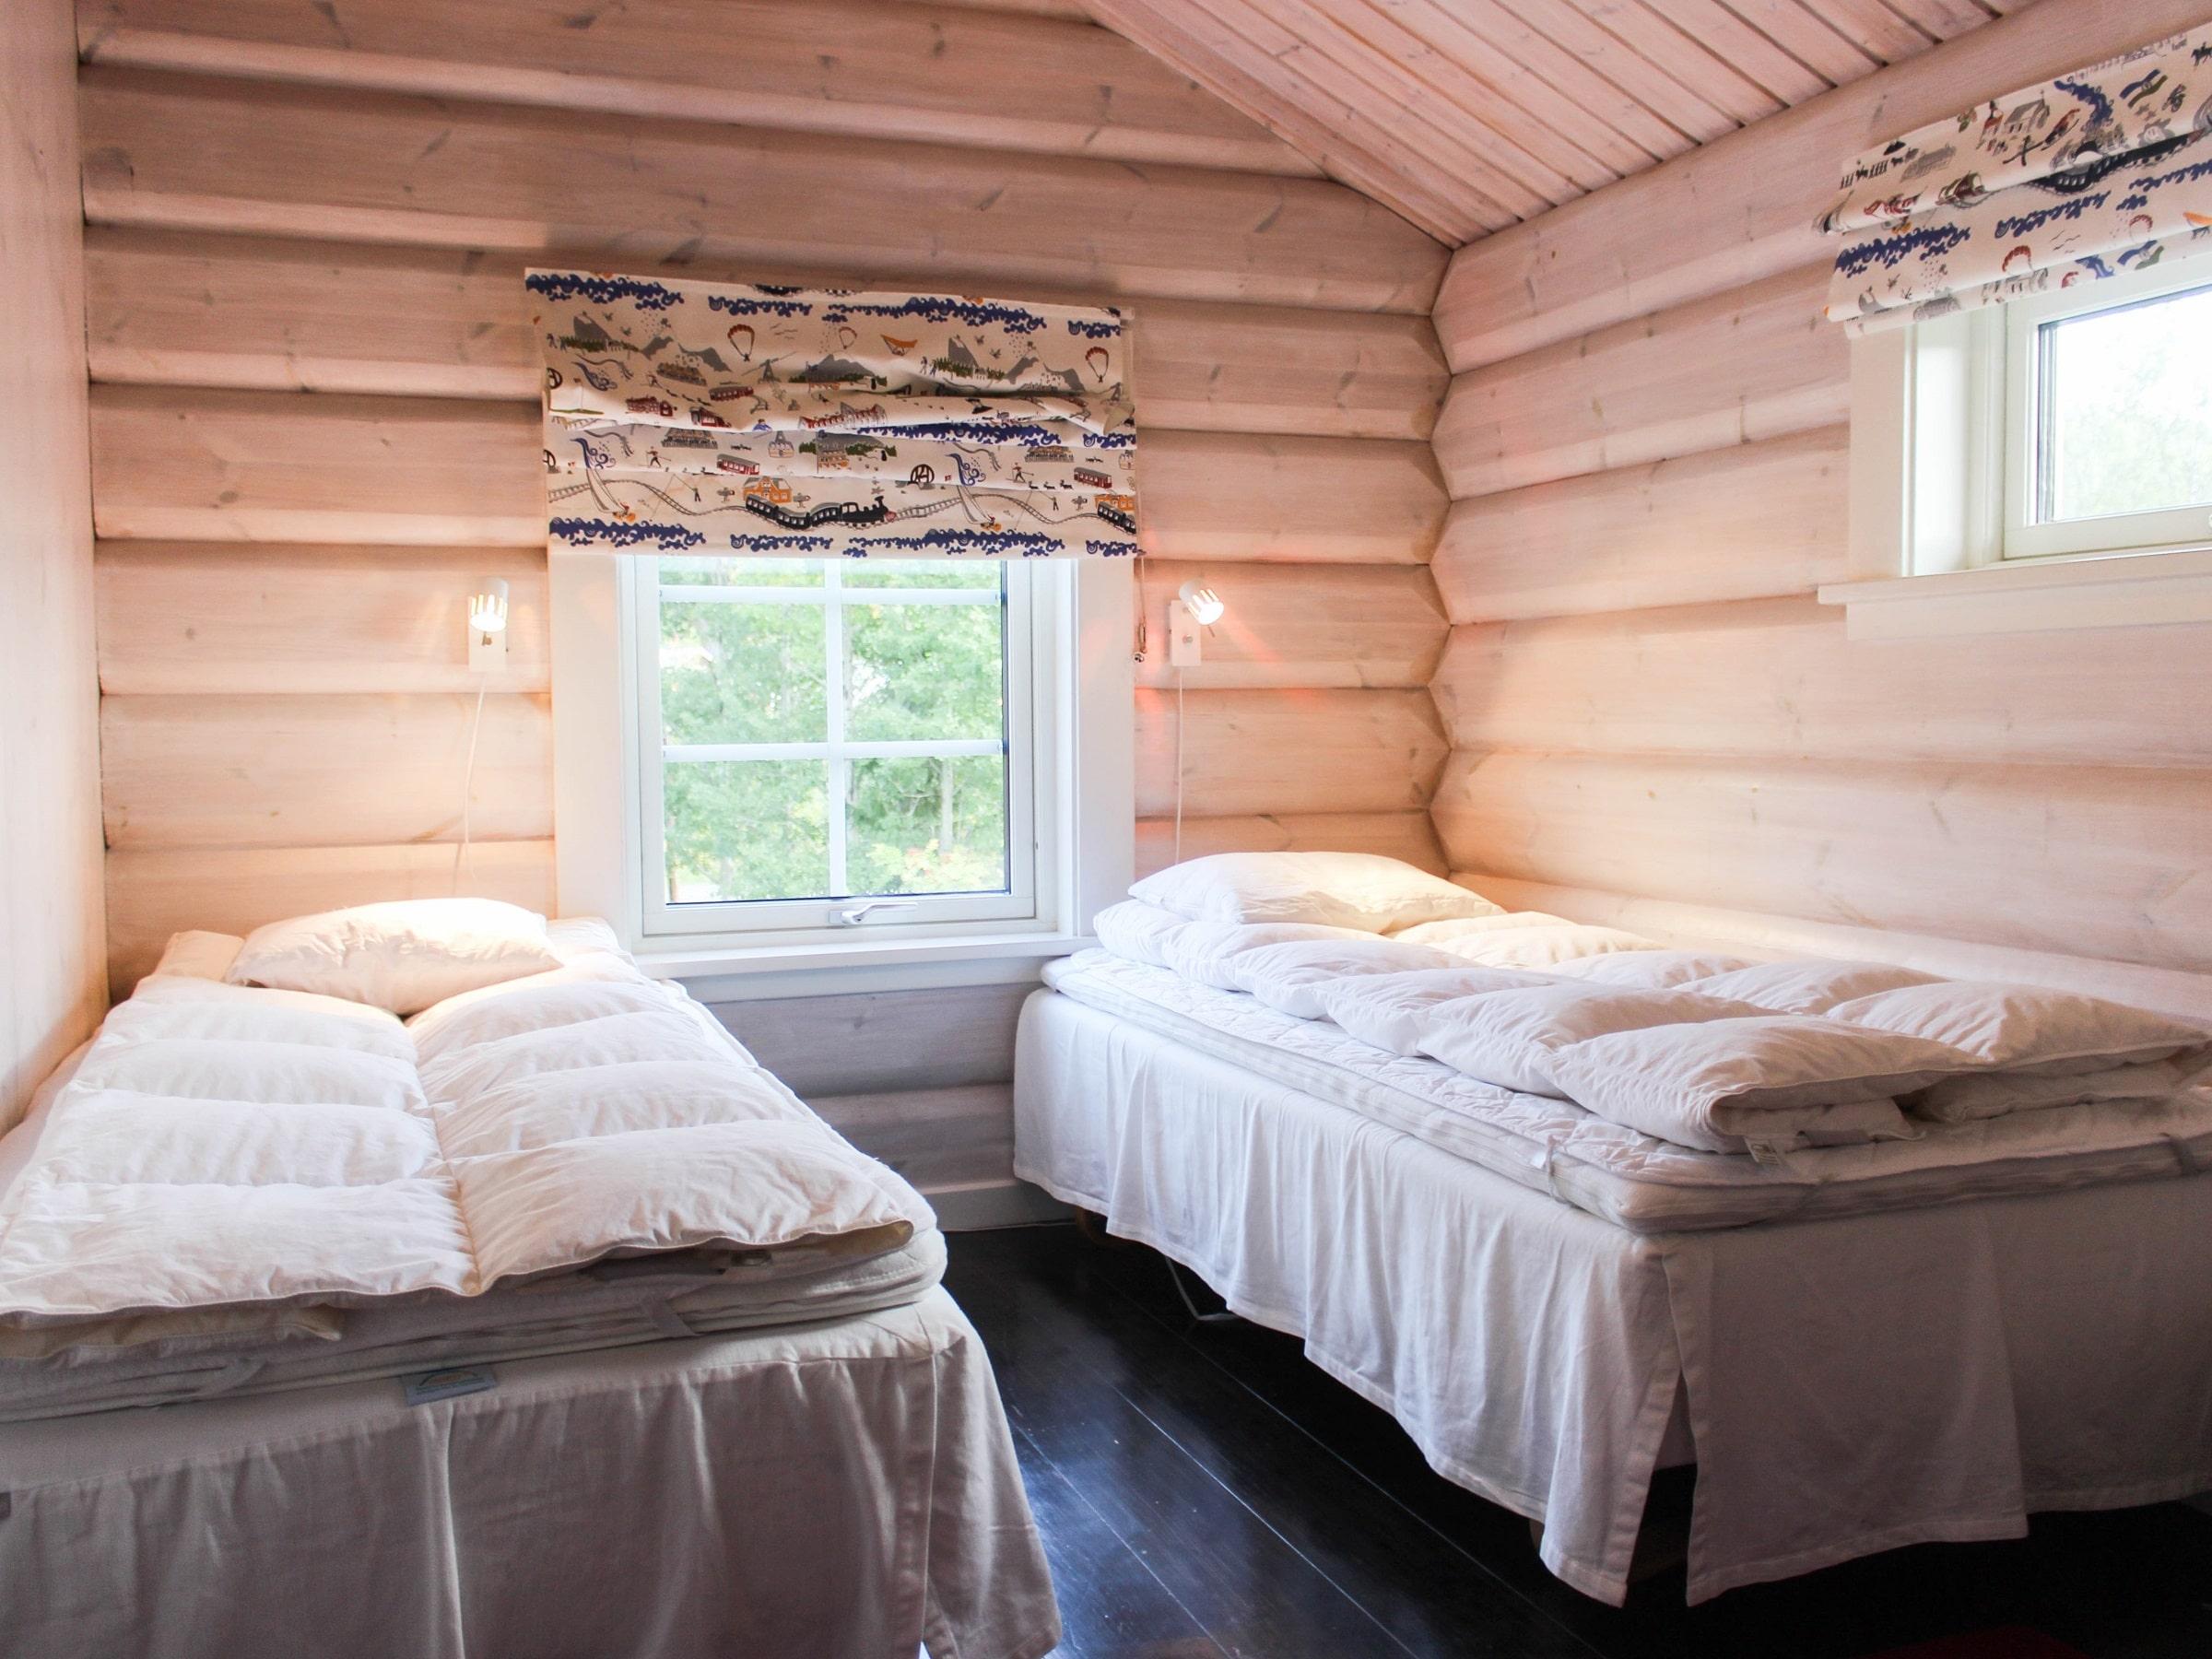 Single beds in a cozy bedroom in Björnängelägret 6 in Åre